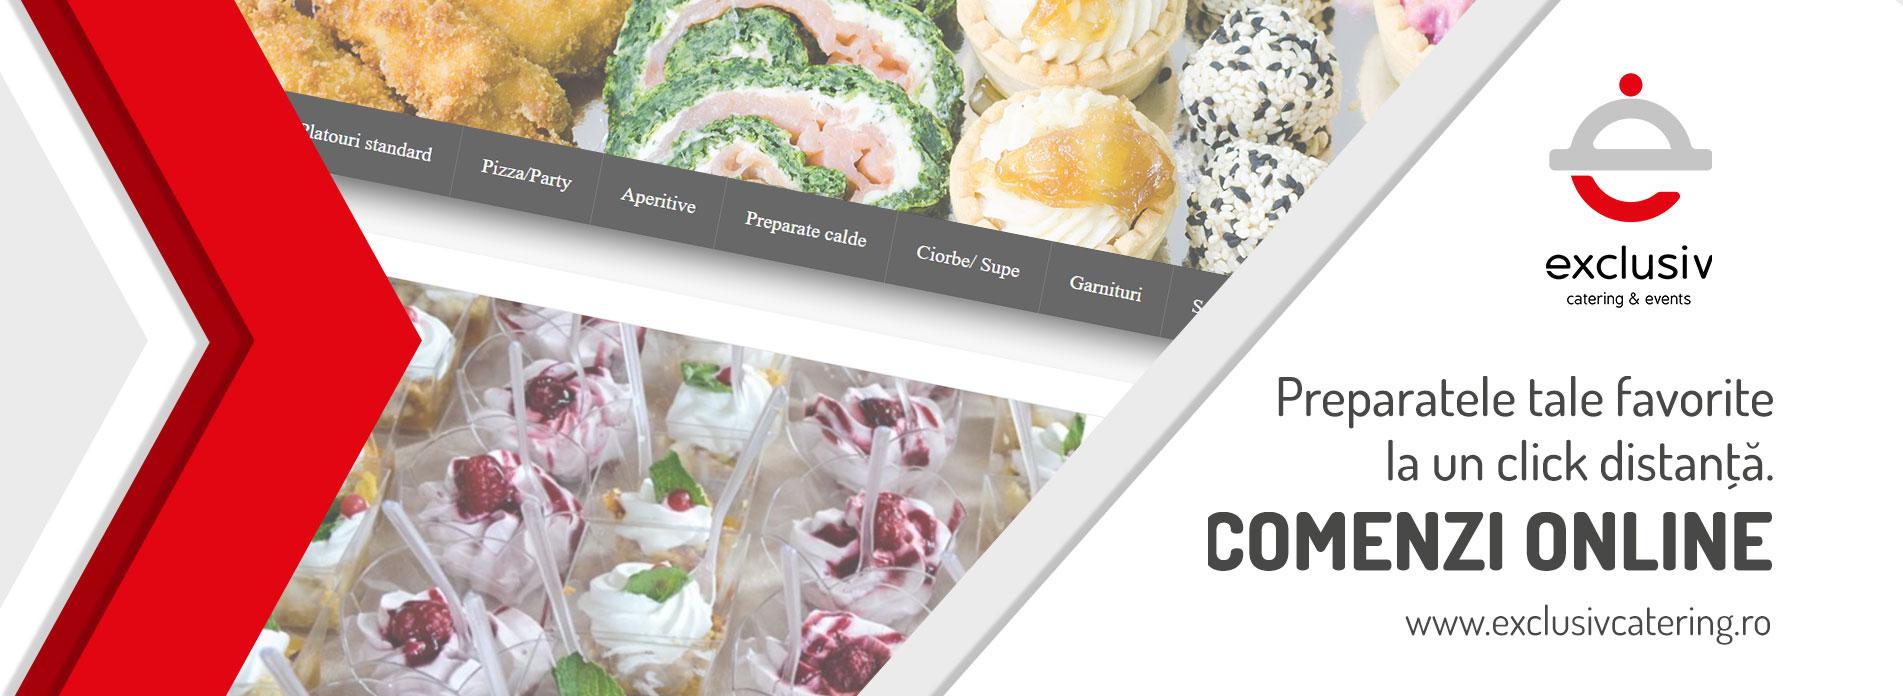 exclusiv-catering-slider-2-comenzi-online